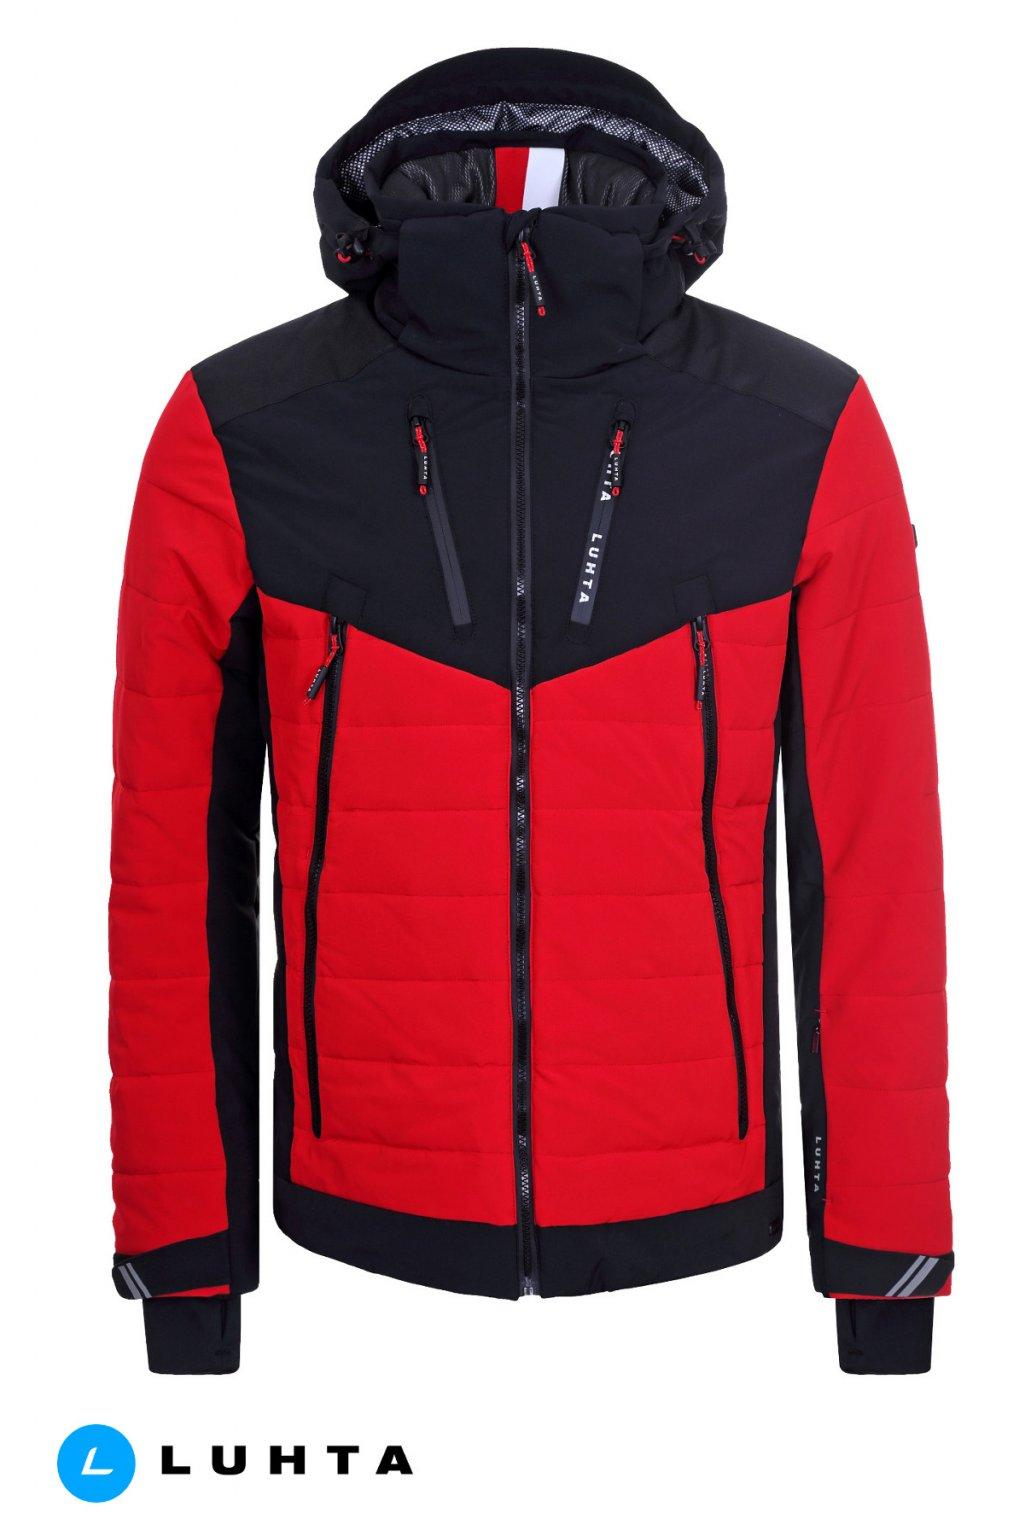 434505 panska lyziarska bunda luhta kurhila cervena